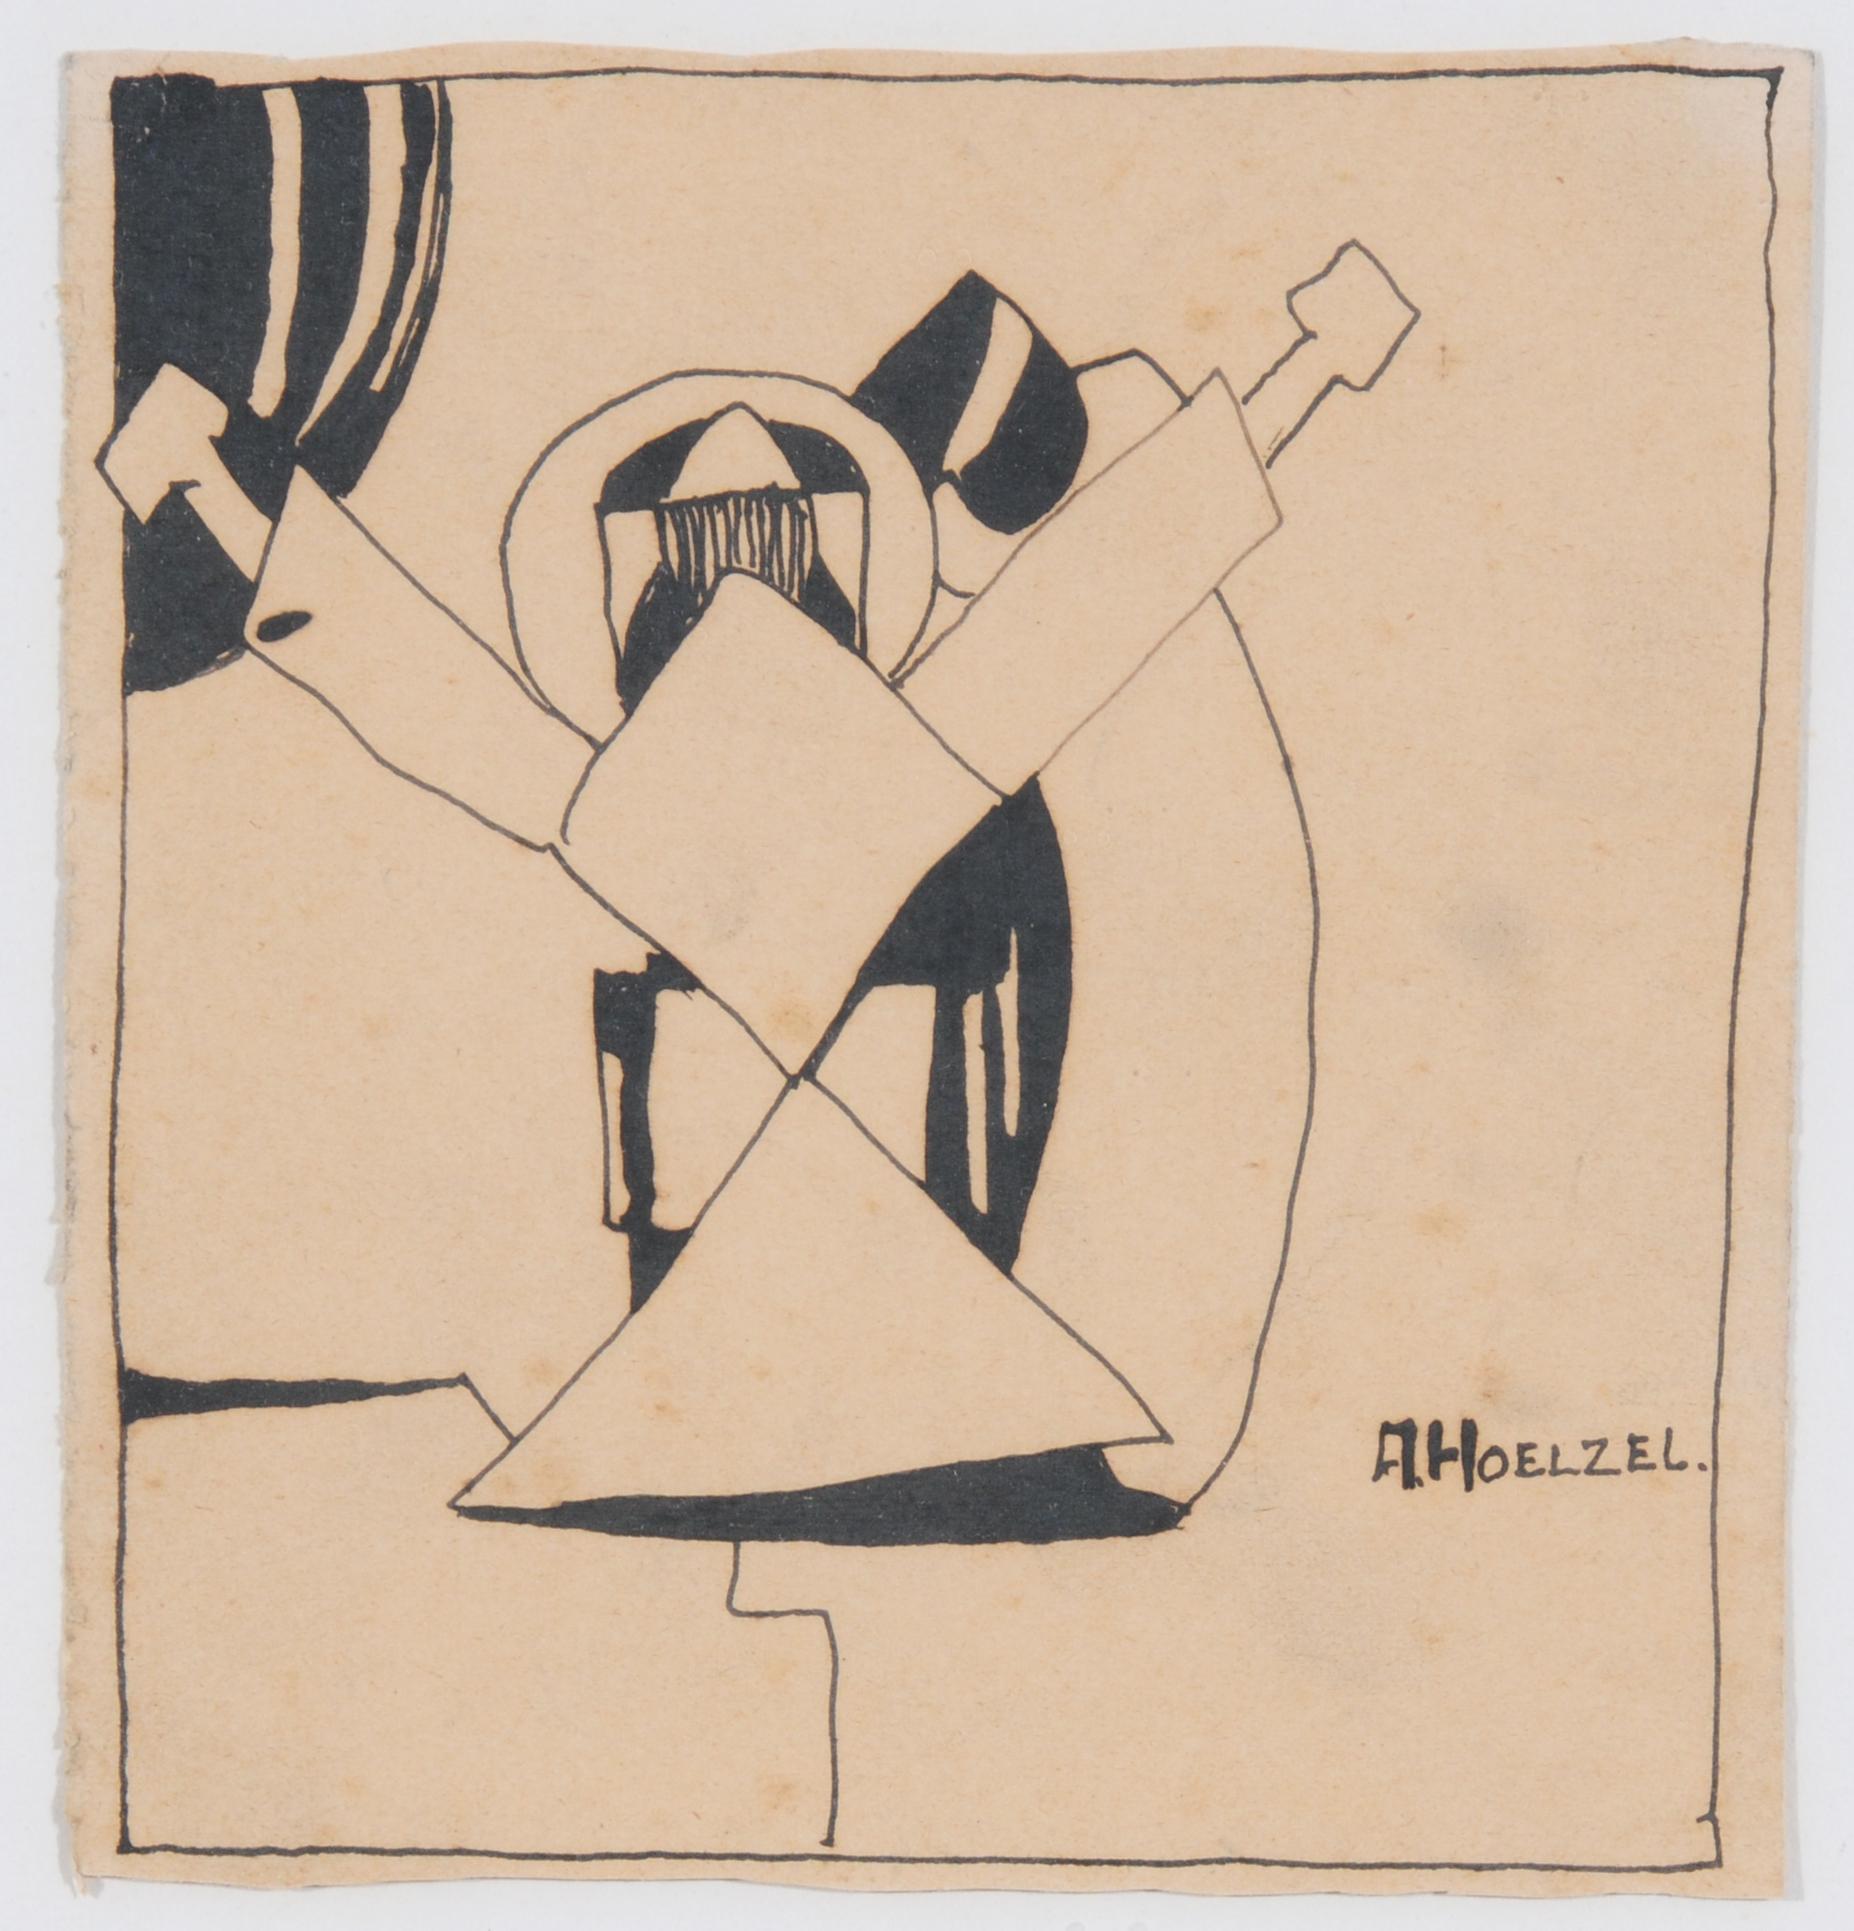 Hölzel Adolf, Untitled